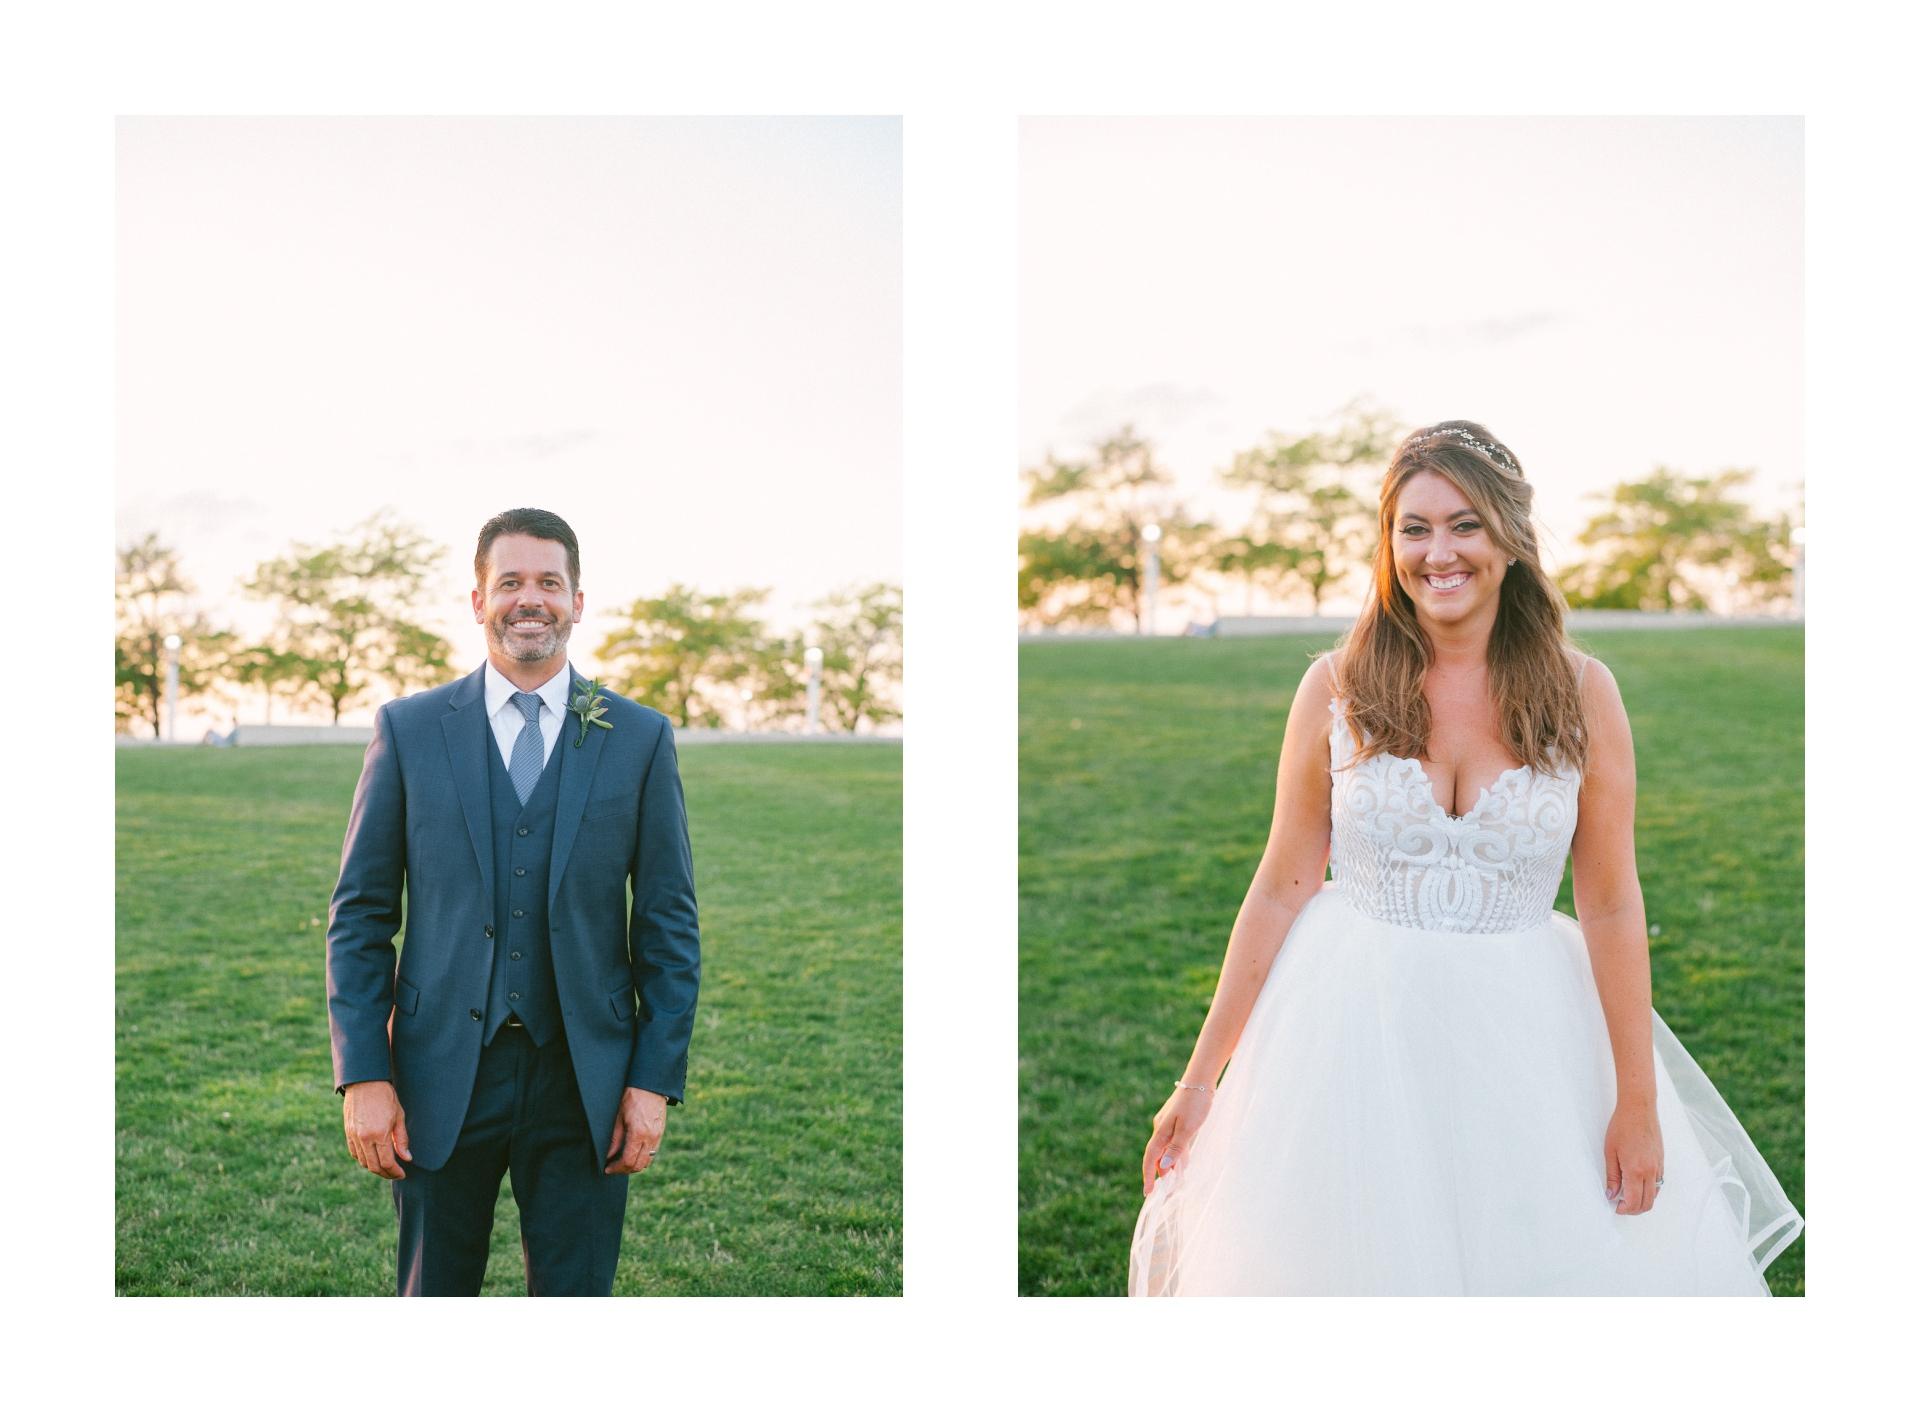 Nuevo Modern Mexican Wedding Photographer in Cleveland 1 49.jpg